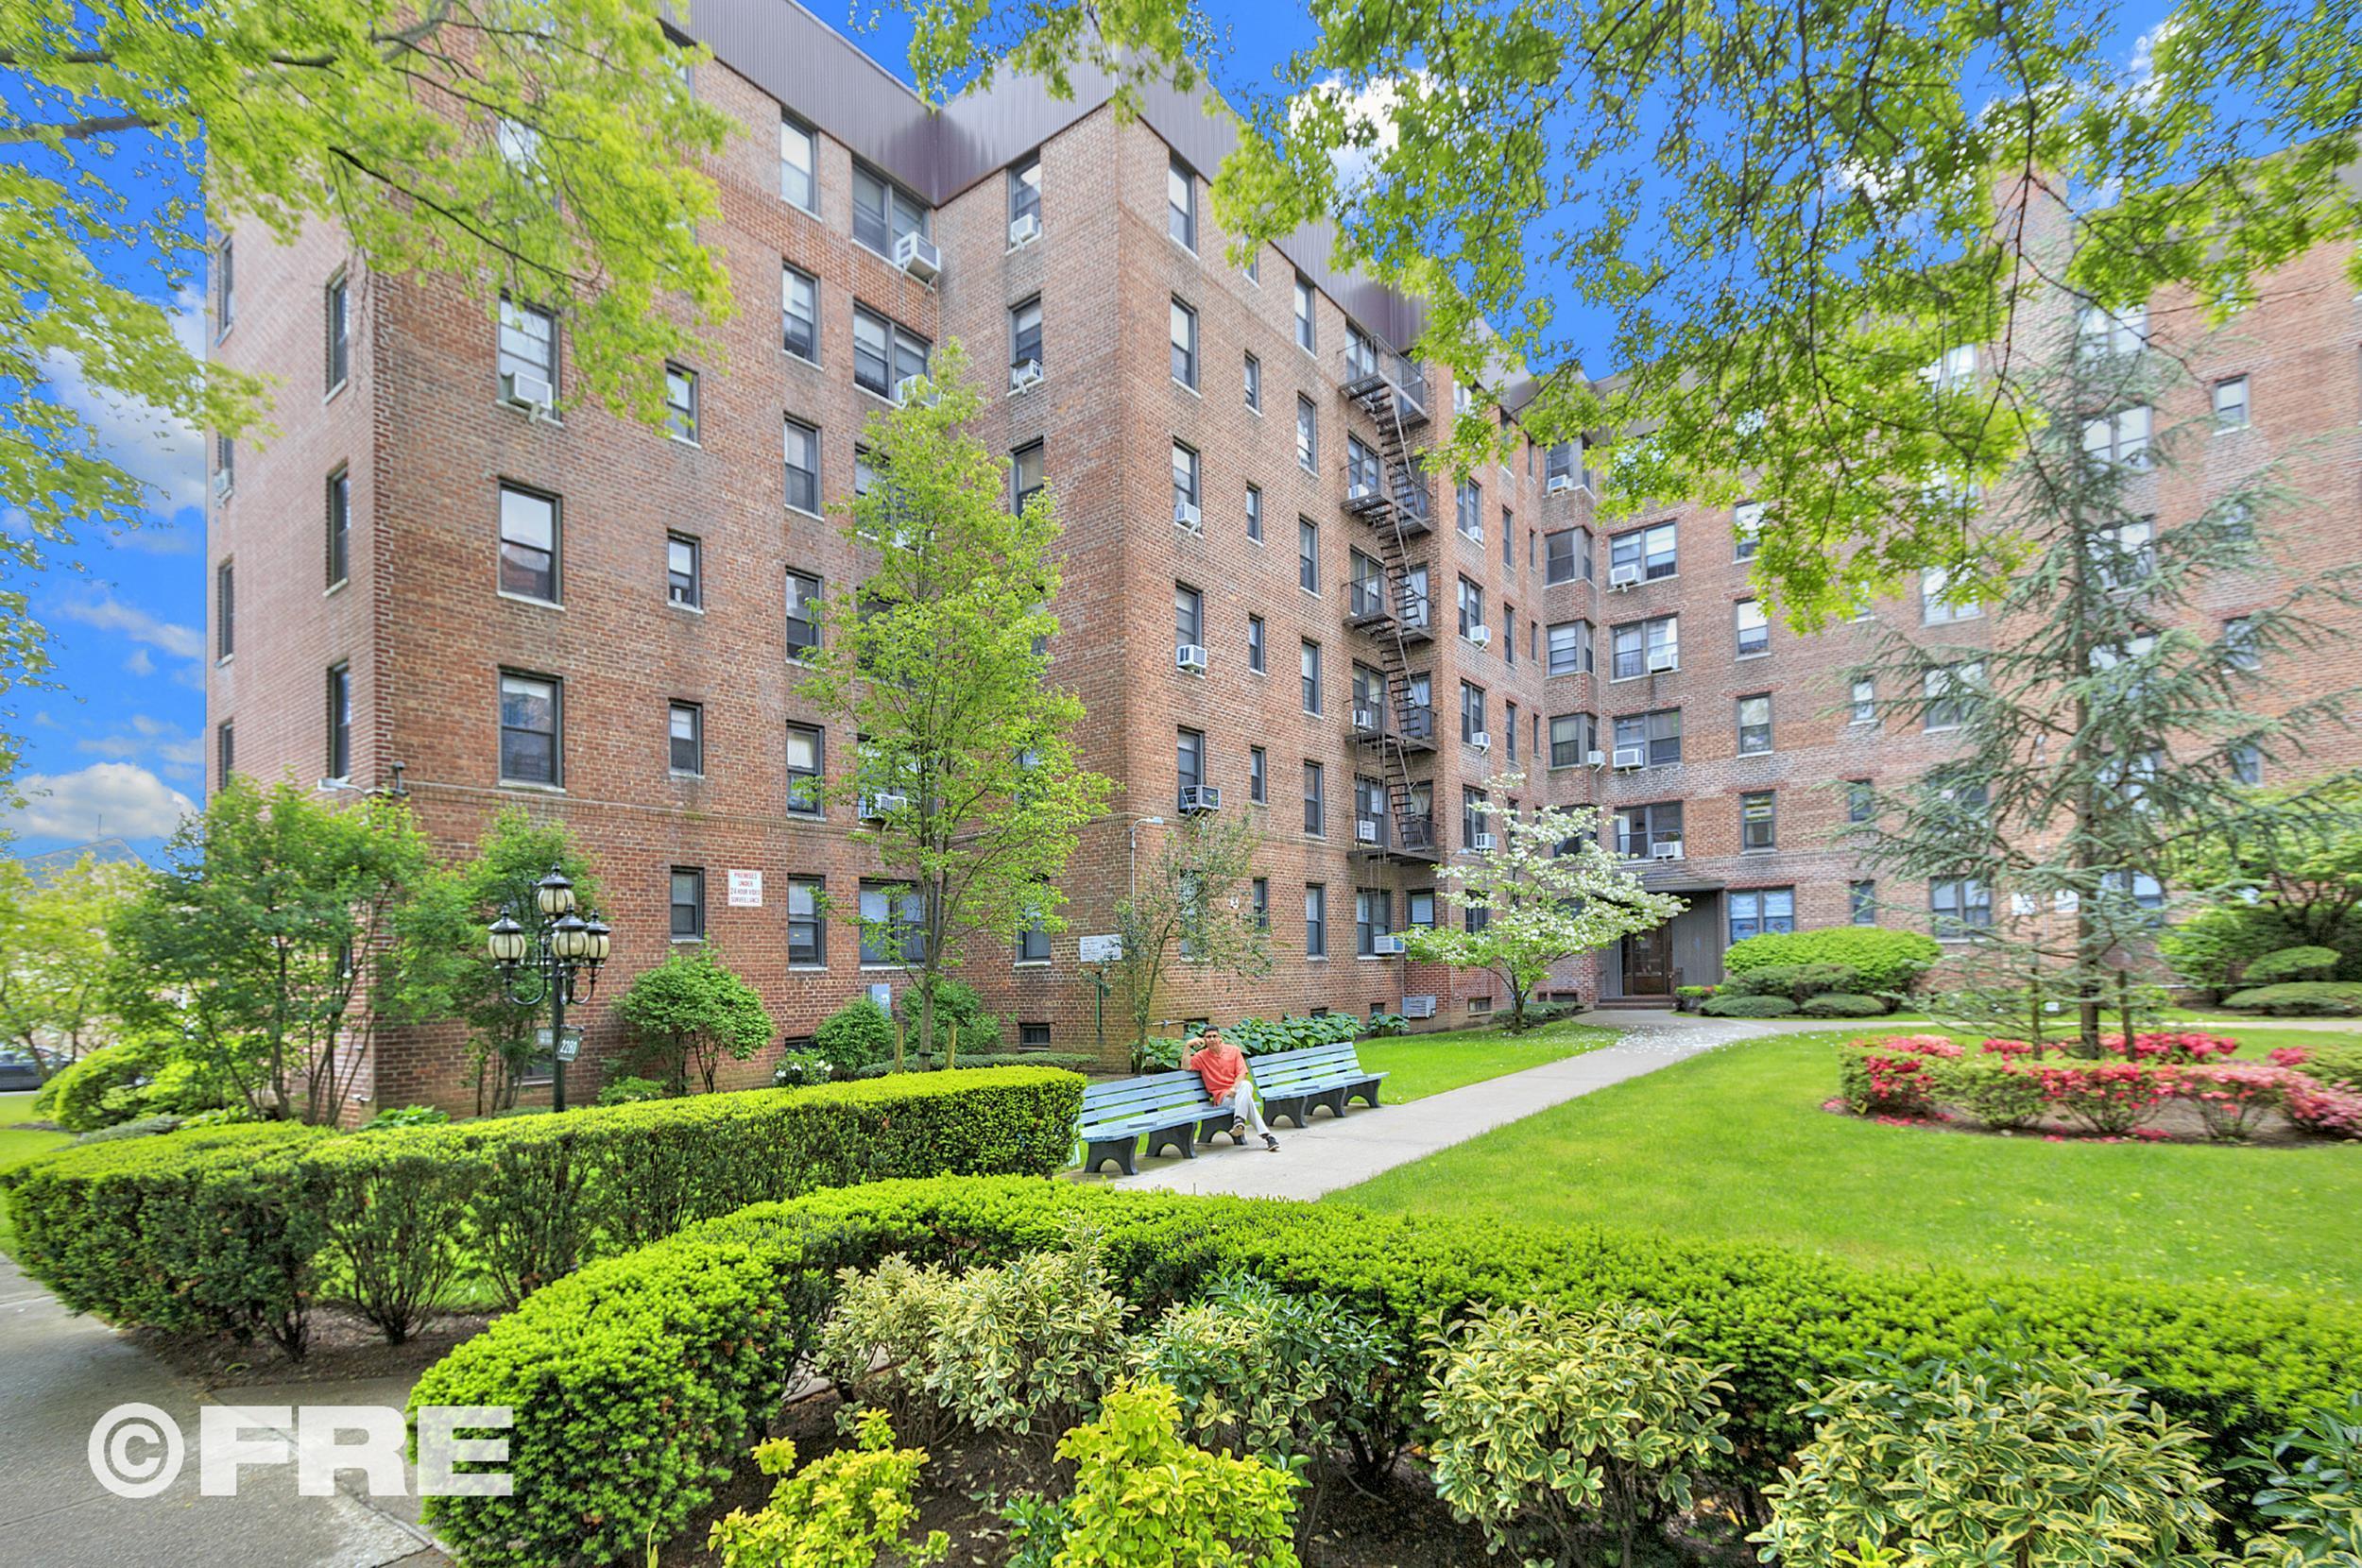 co-op buildings in Brooklyn, real estate agents in brooklyn